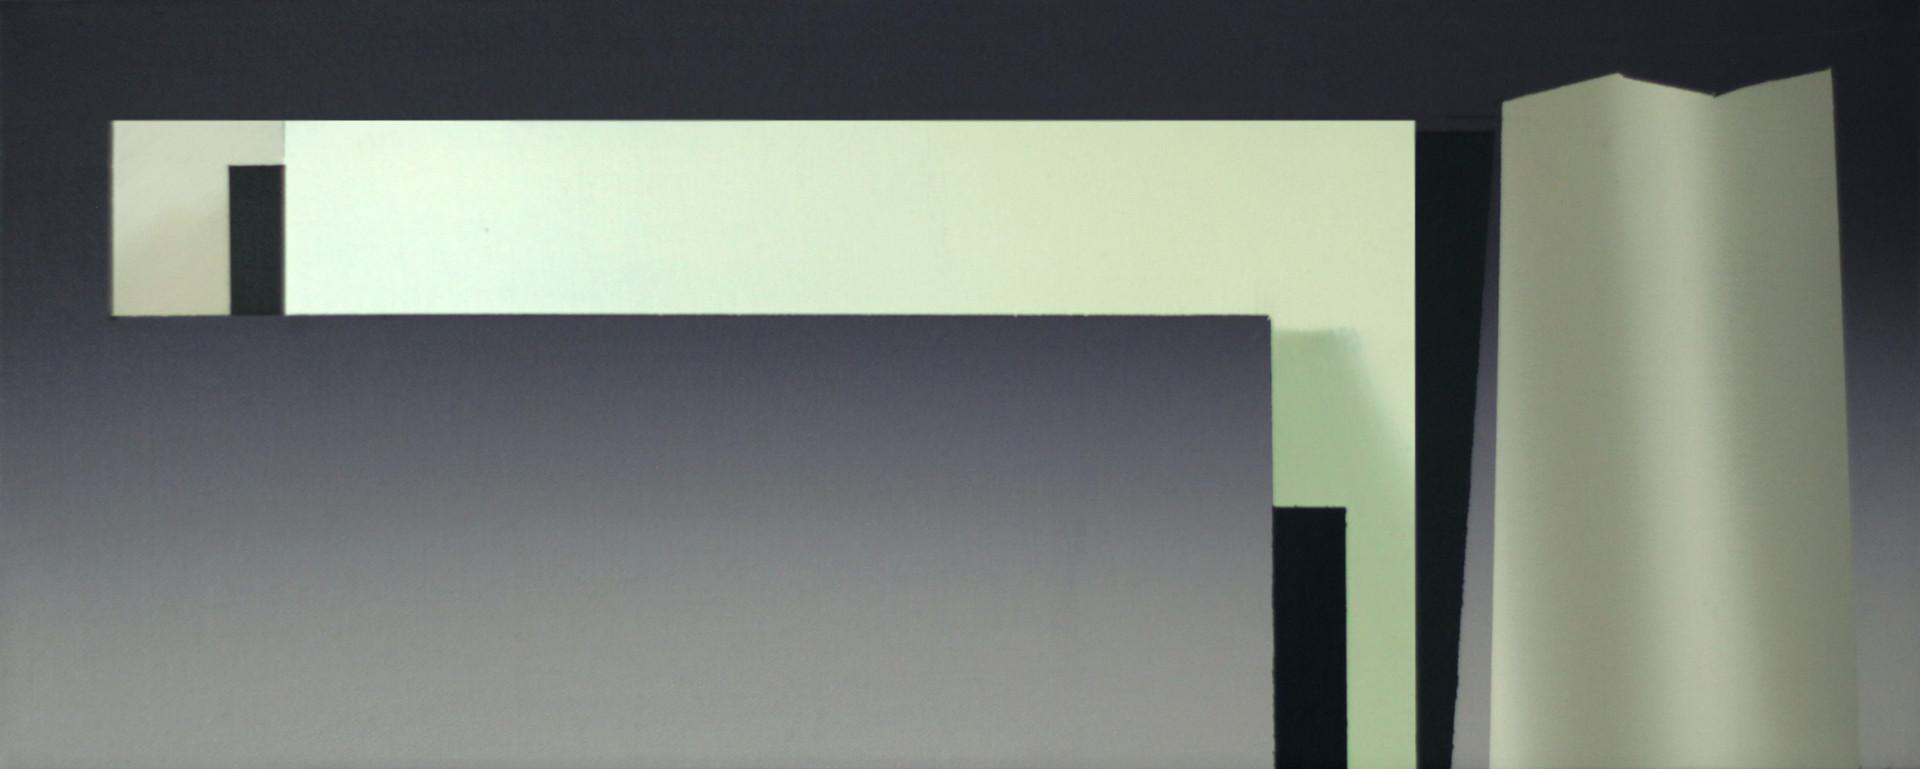 Plyg, oil on canvas, 50 x 20 cm, 2020